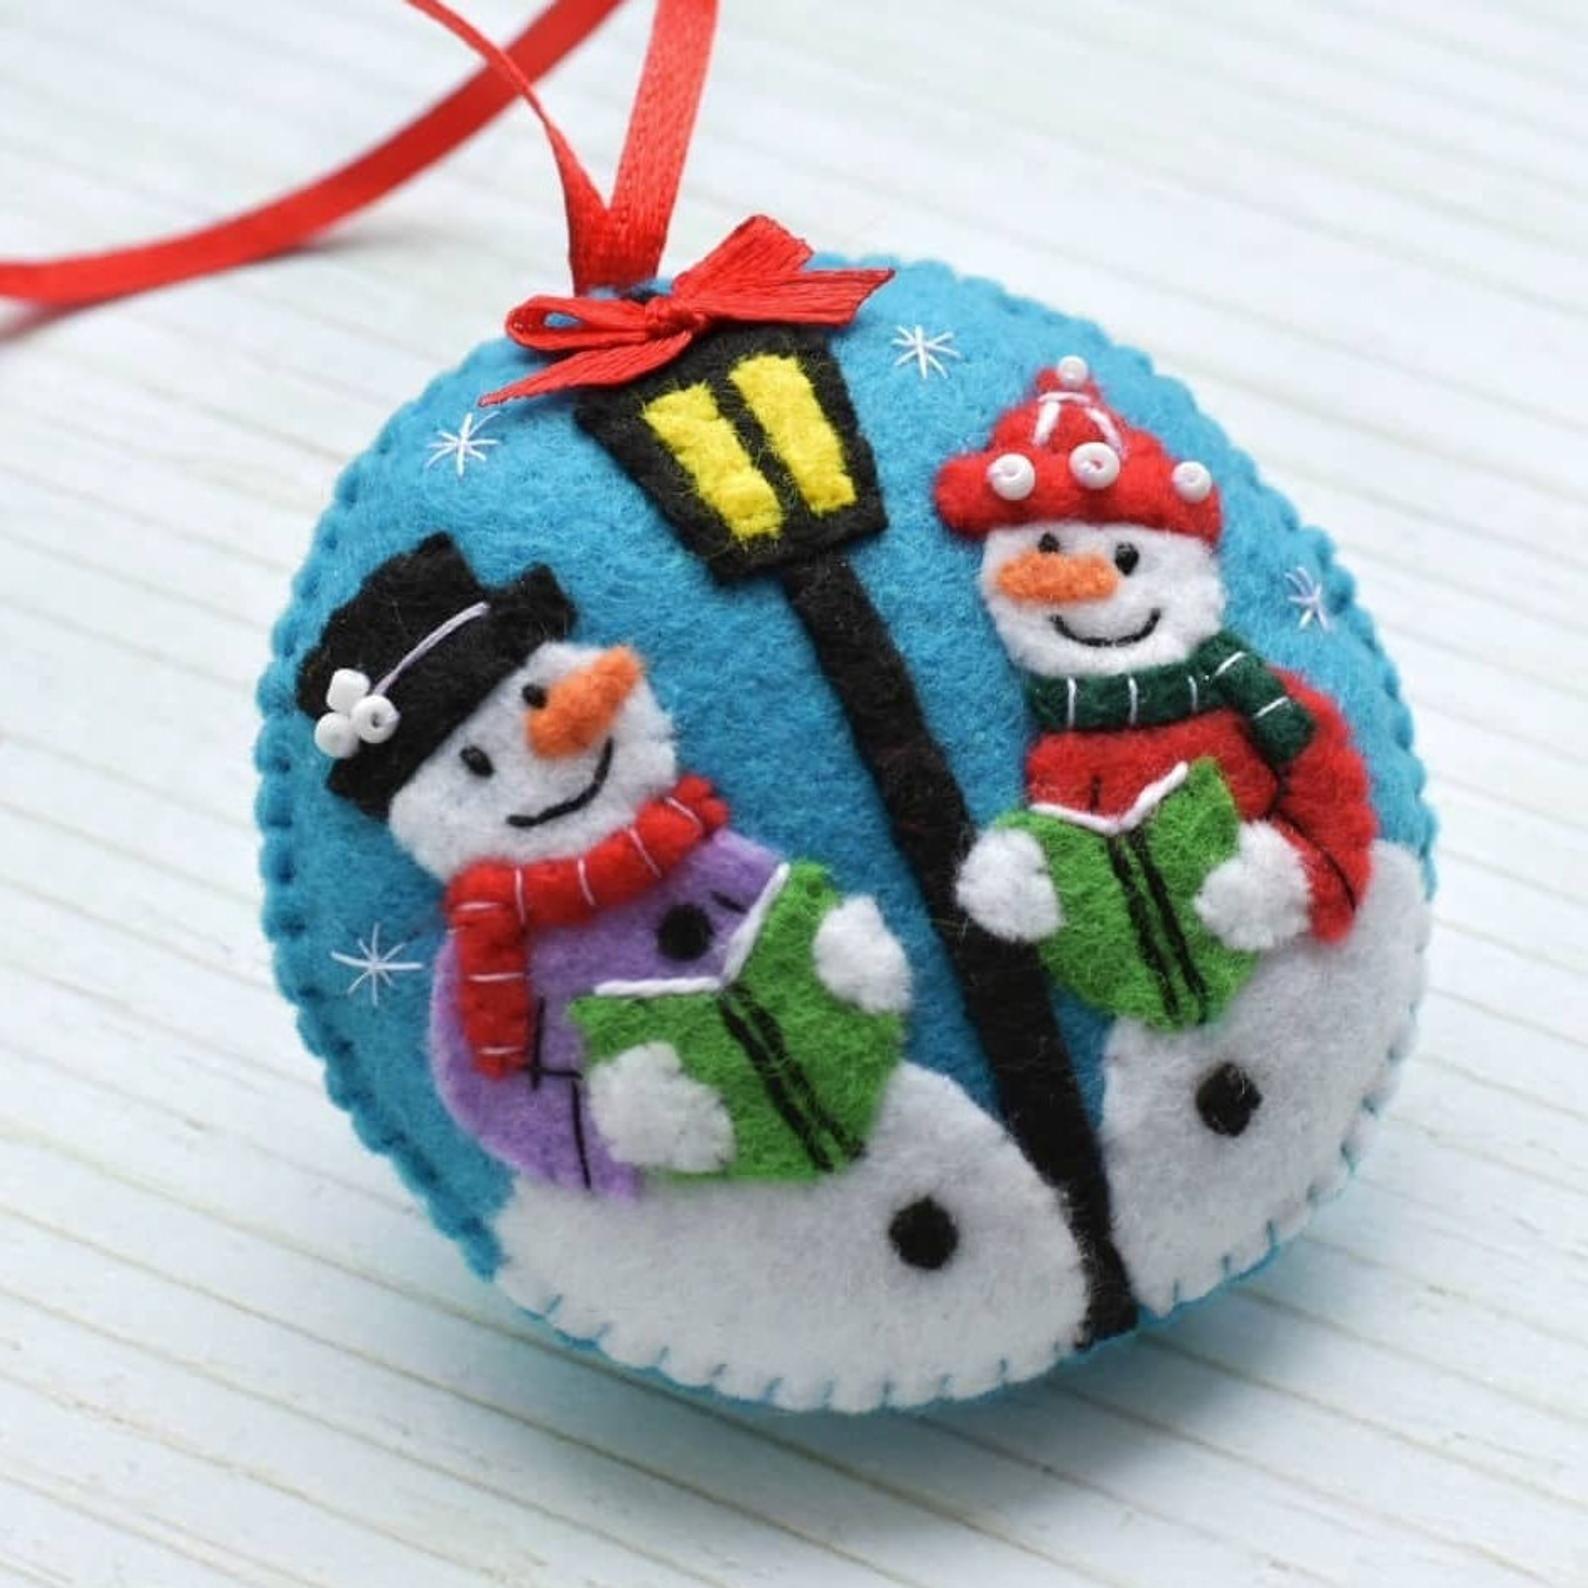 Christmas Decorations Felt Snowman Ornament Snowman Decor Etsy Handmade Felt Ornament Felt Christmas Decorations Felt Ornaments